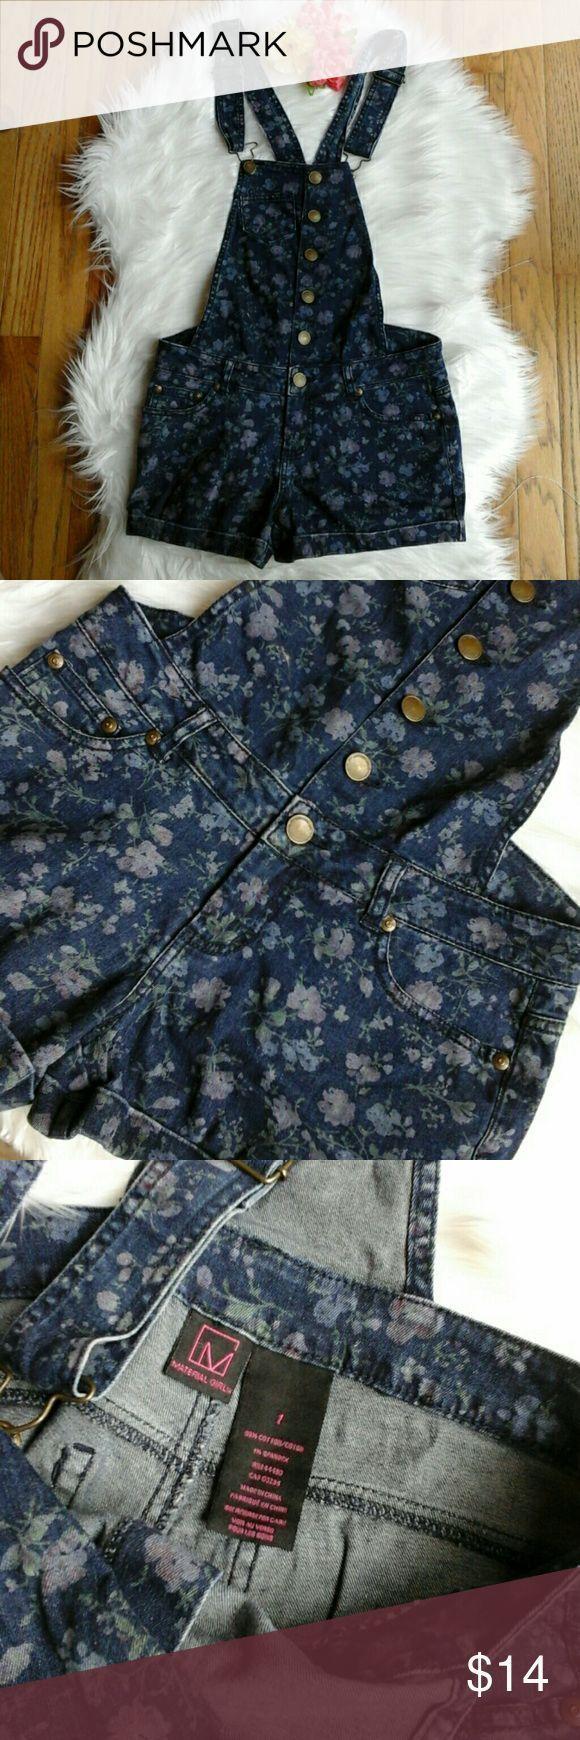 Tendance salopette 2017  Navy Floral Denim Shortalls Super cute floral denim overall shorts! Perfect to p